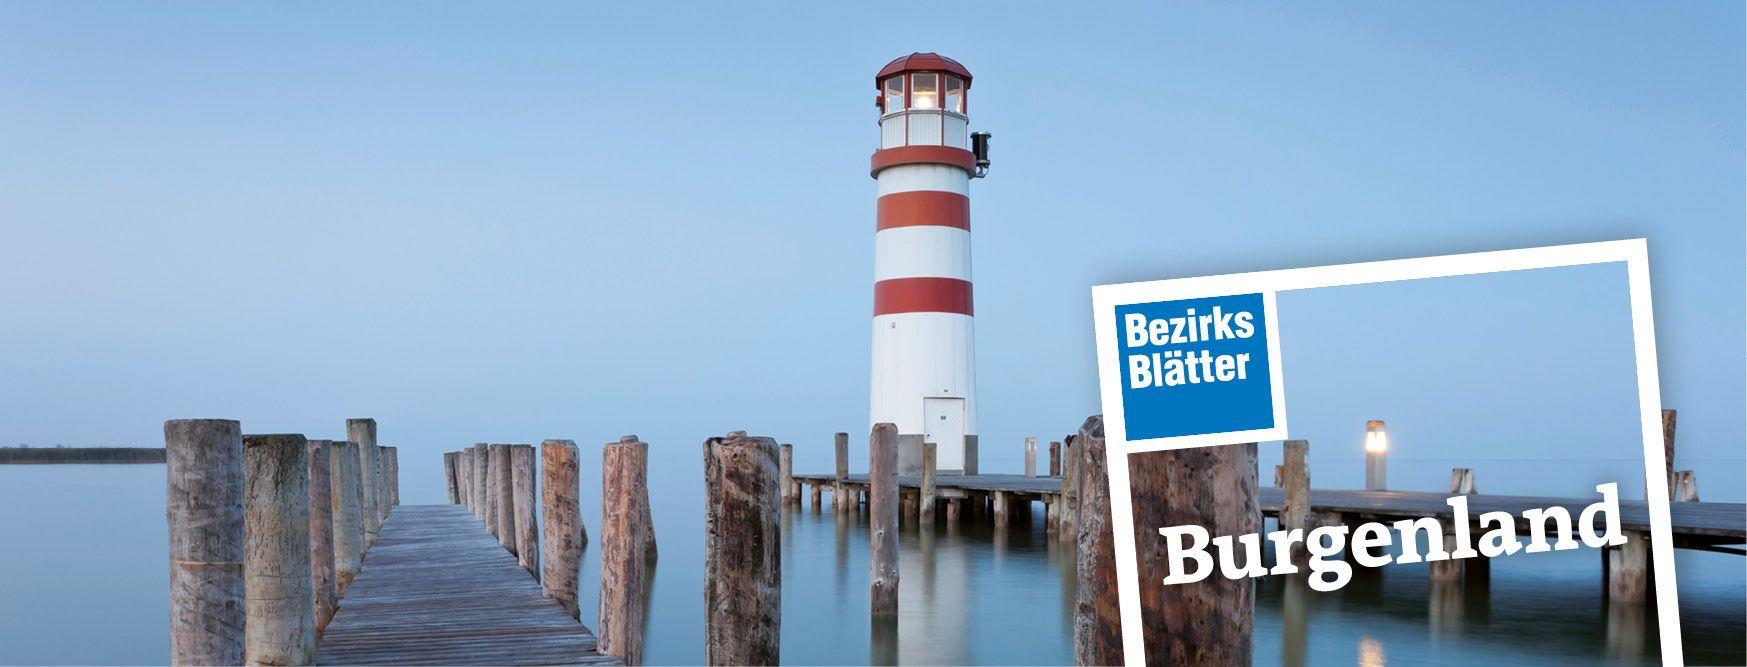 Bezirksblätter Burgenland: Tarif, Kontakt, E-Paper, meinbezirk.at, Mediadaten, Streuliste, Beilagen, Technische Daten